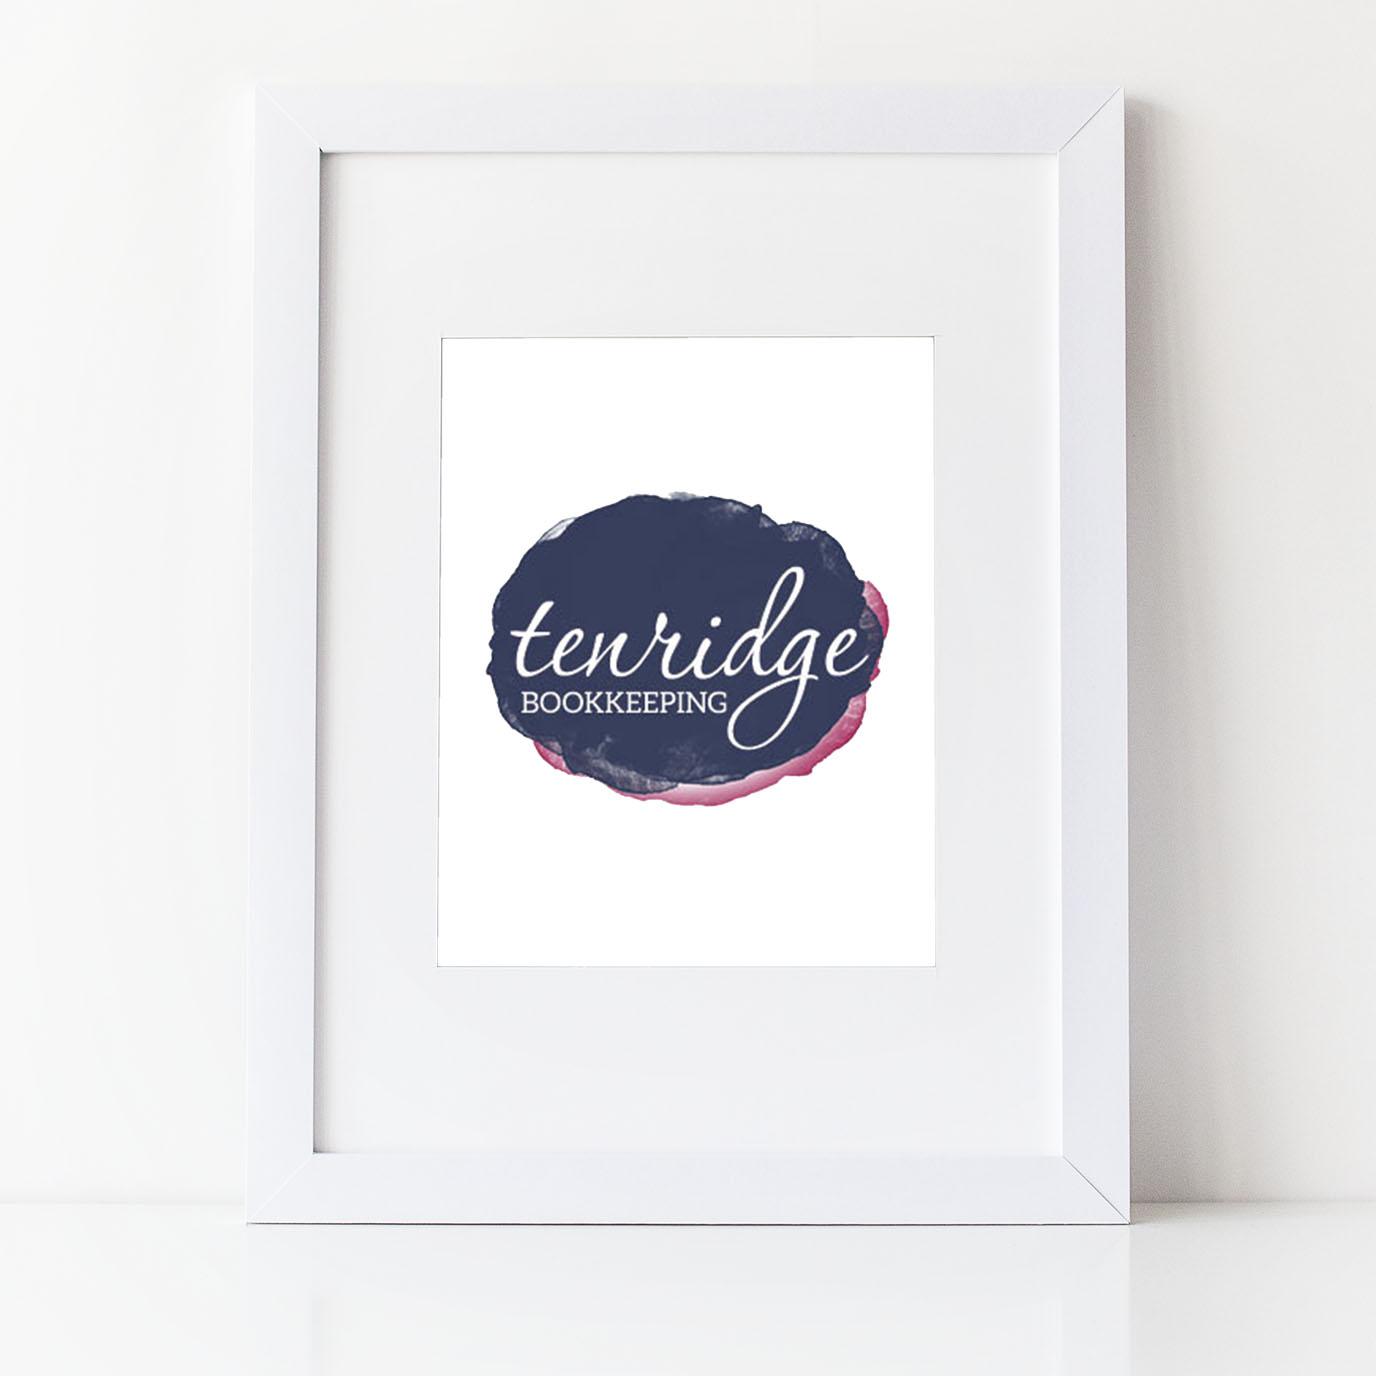 Tenridge logo mockup.jpg